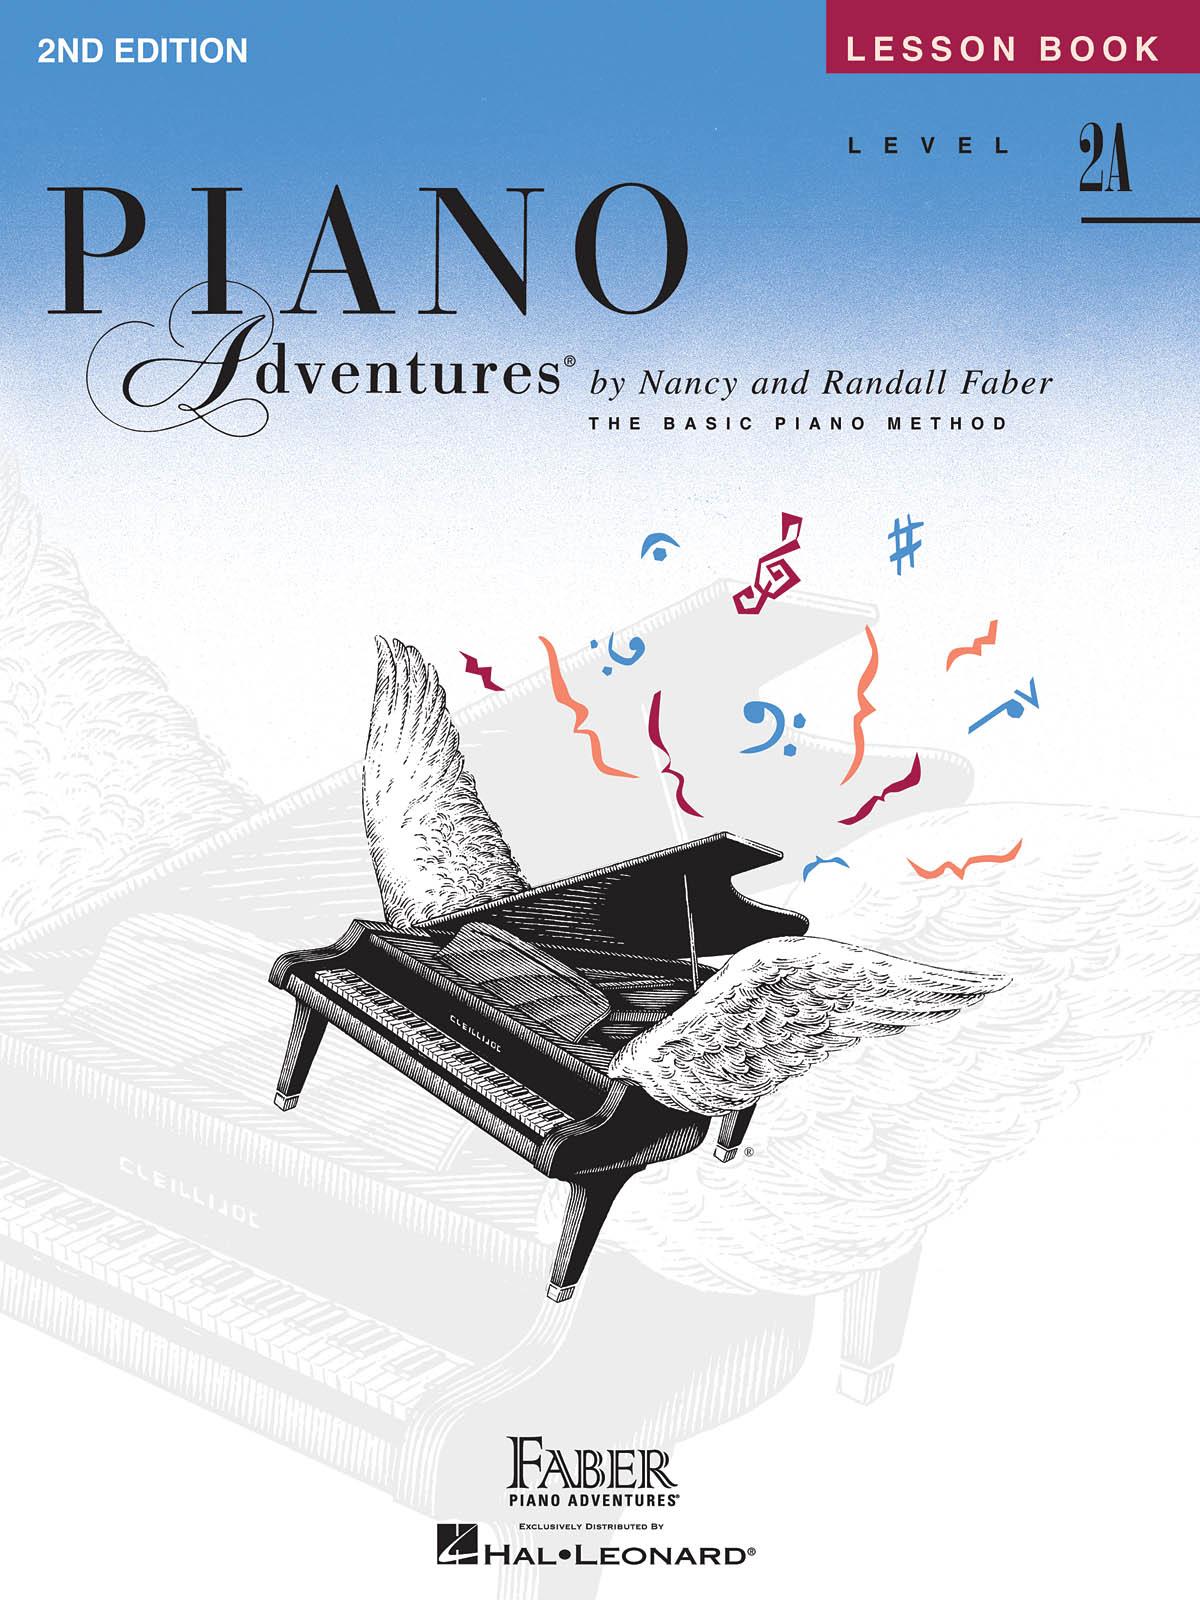 Faber Piano Adventures, Lesson Book, Level 2A